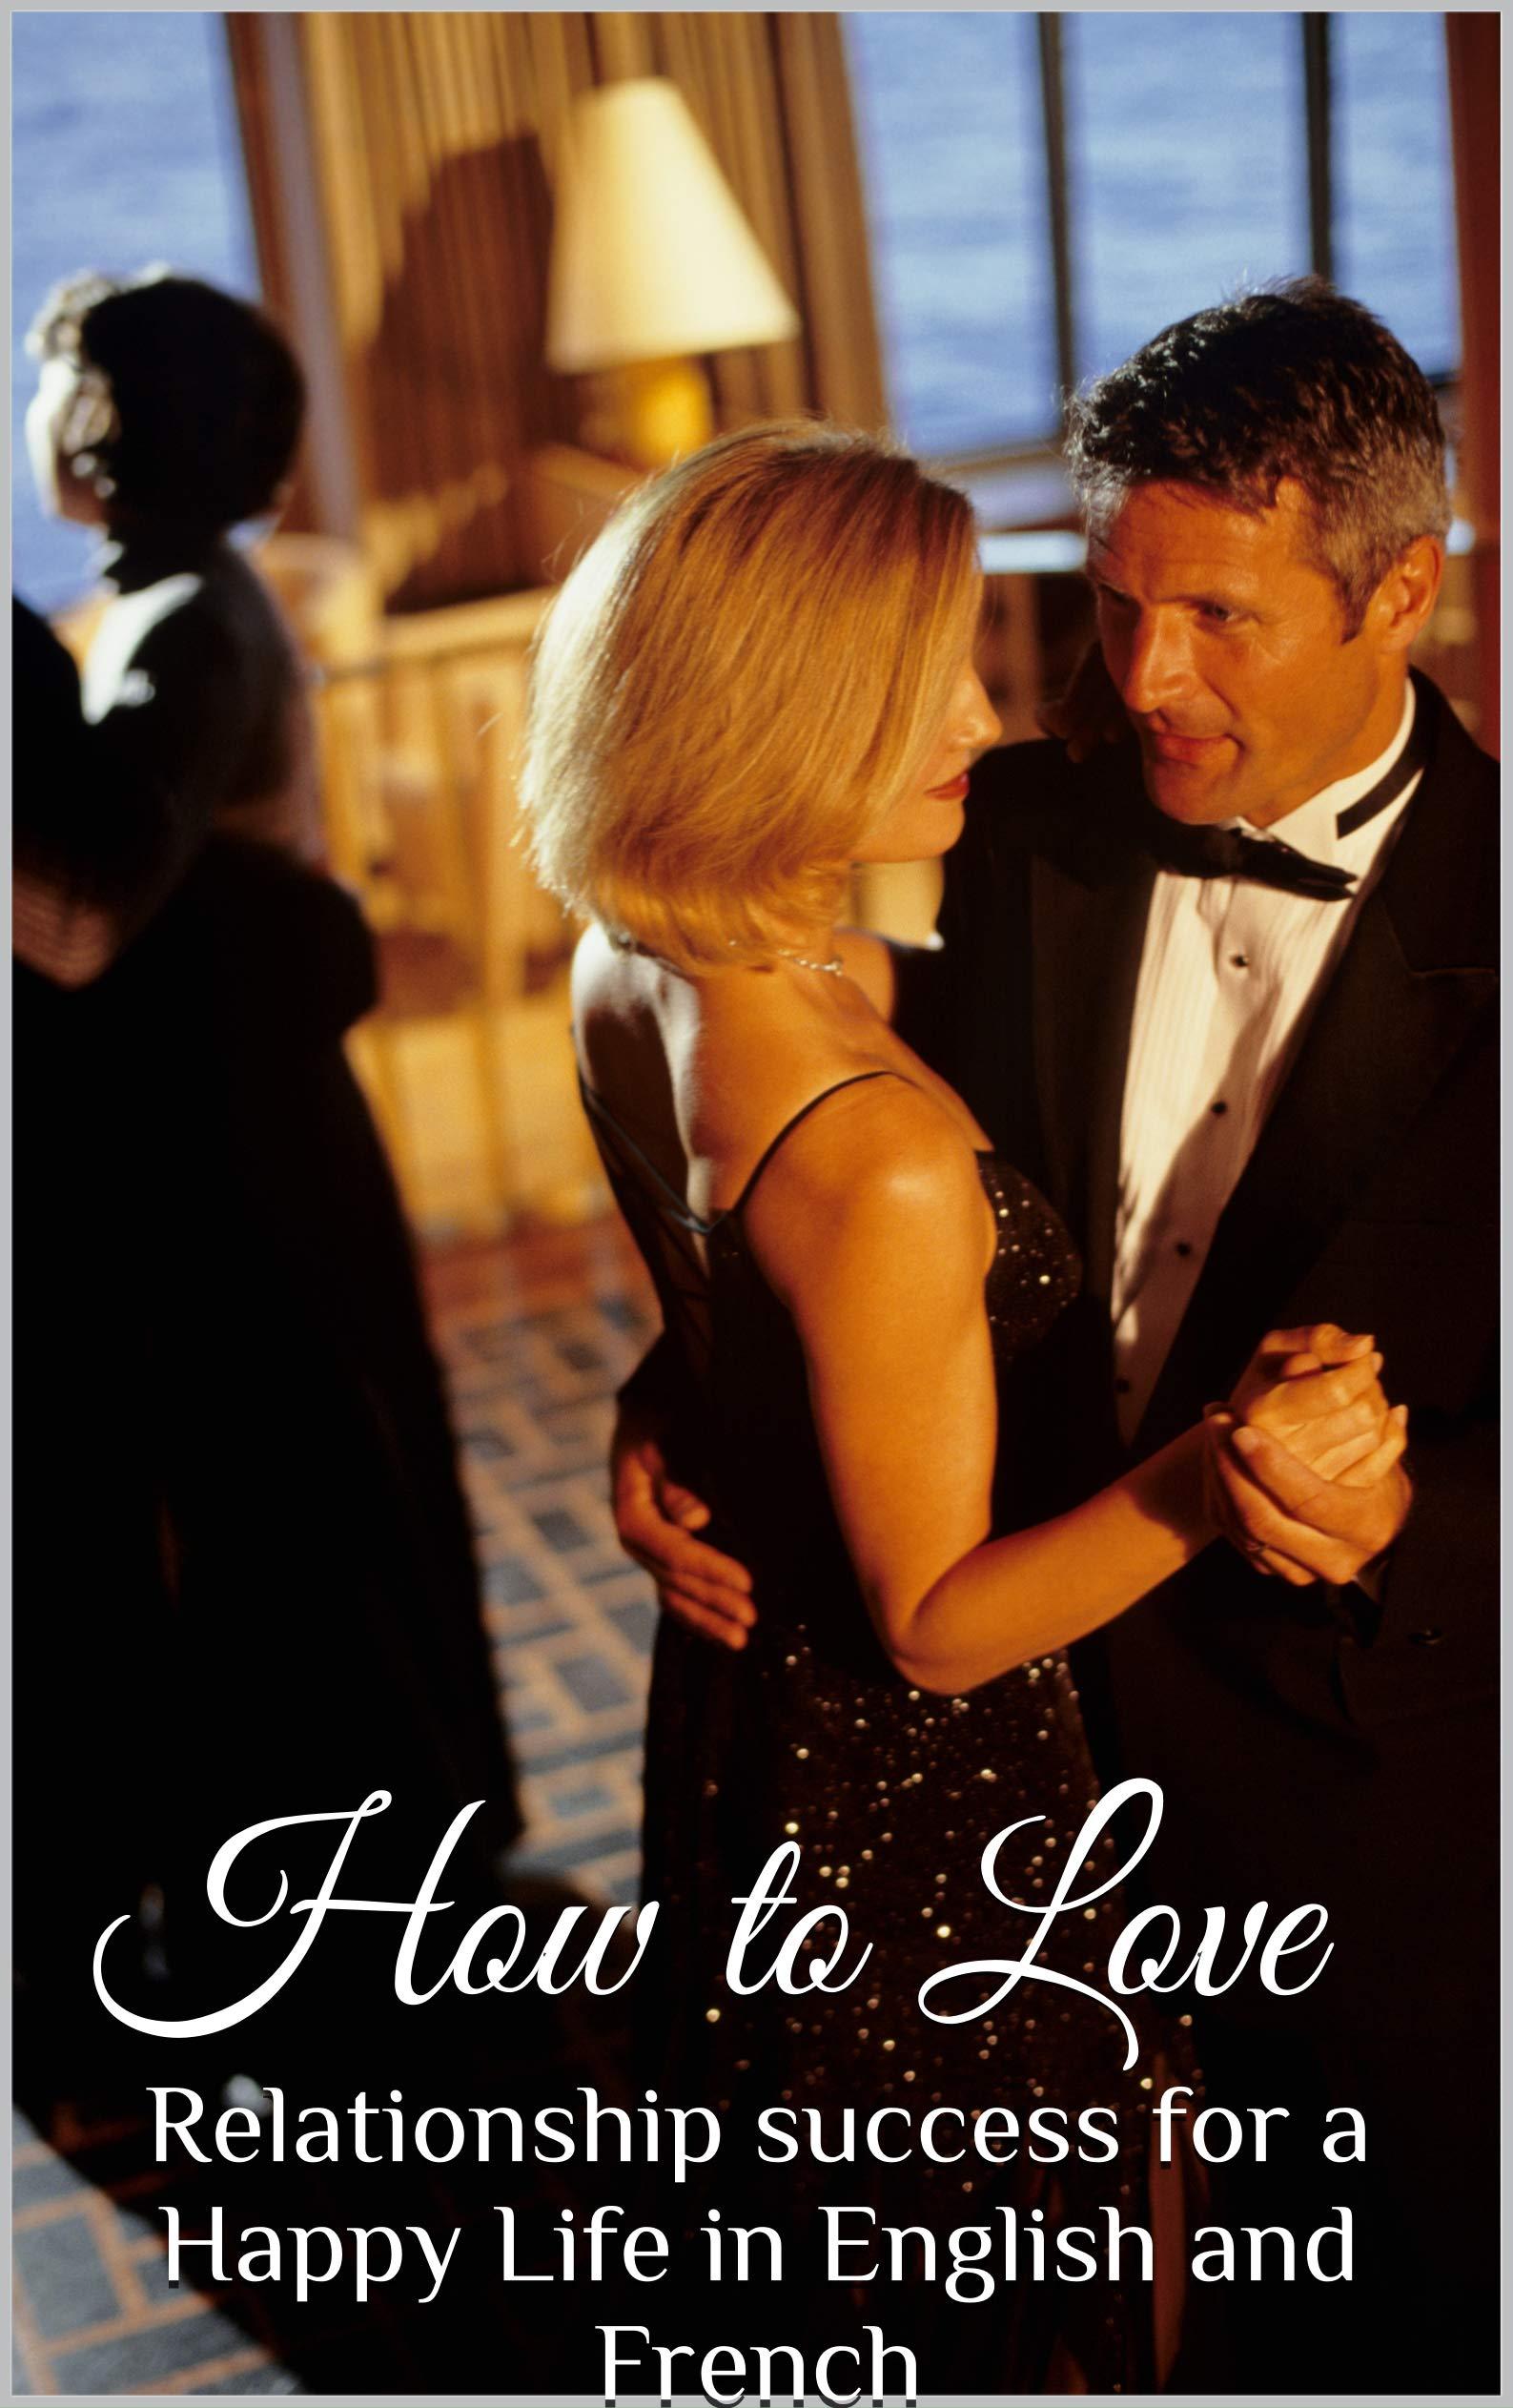 How to Love : Relationship Success for a Happy Life in English and français (Merci à dean koontz , Rumi, Khalil Gibran, sadhguru , Oprah winfrey, Mathew ... , Gary Chapman , Bible) (French Edition)